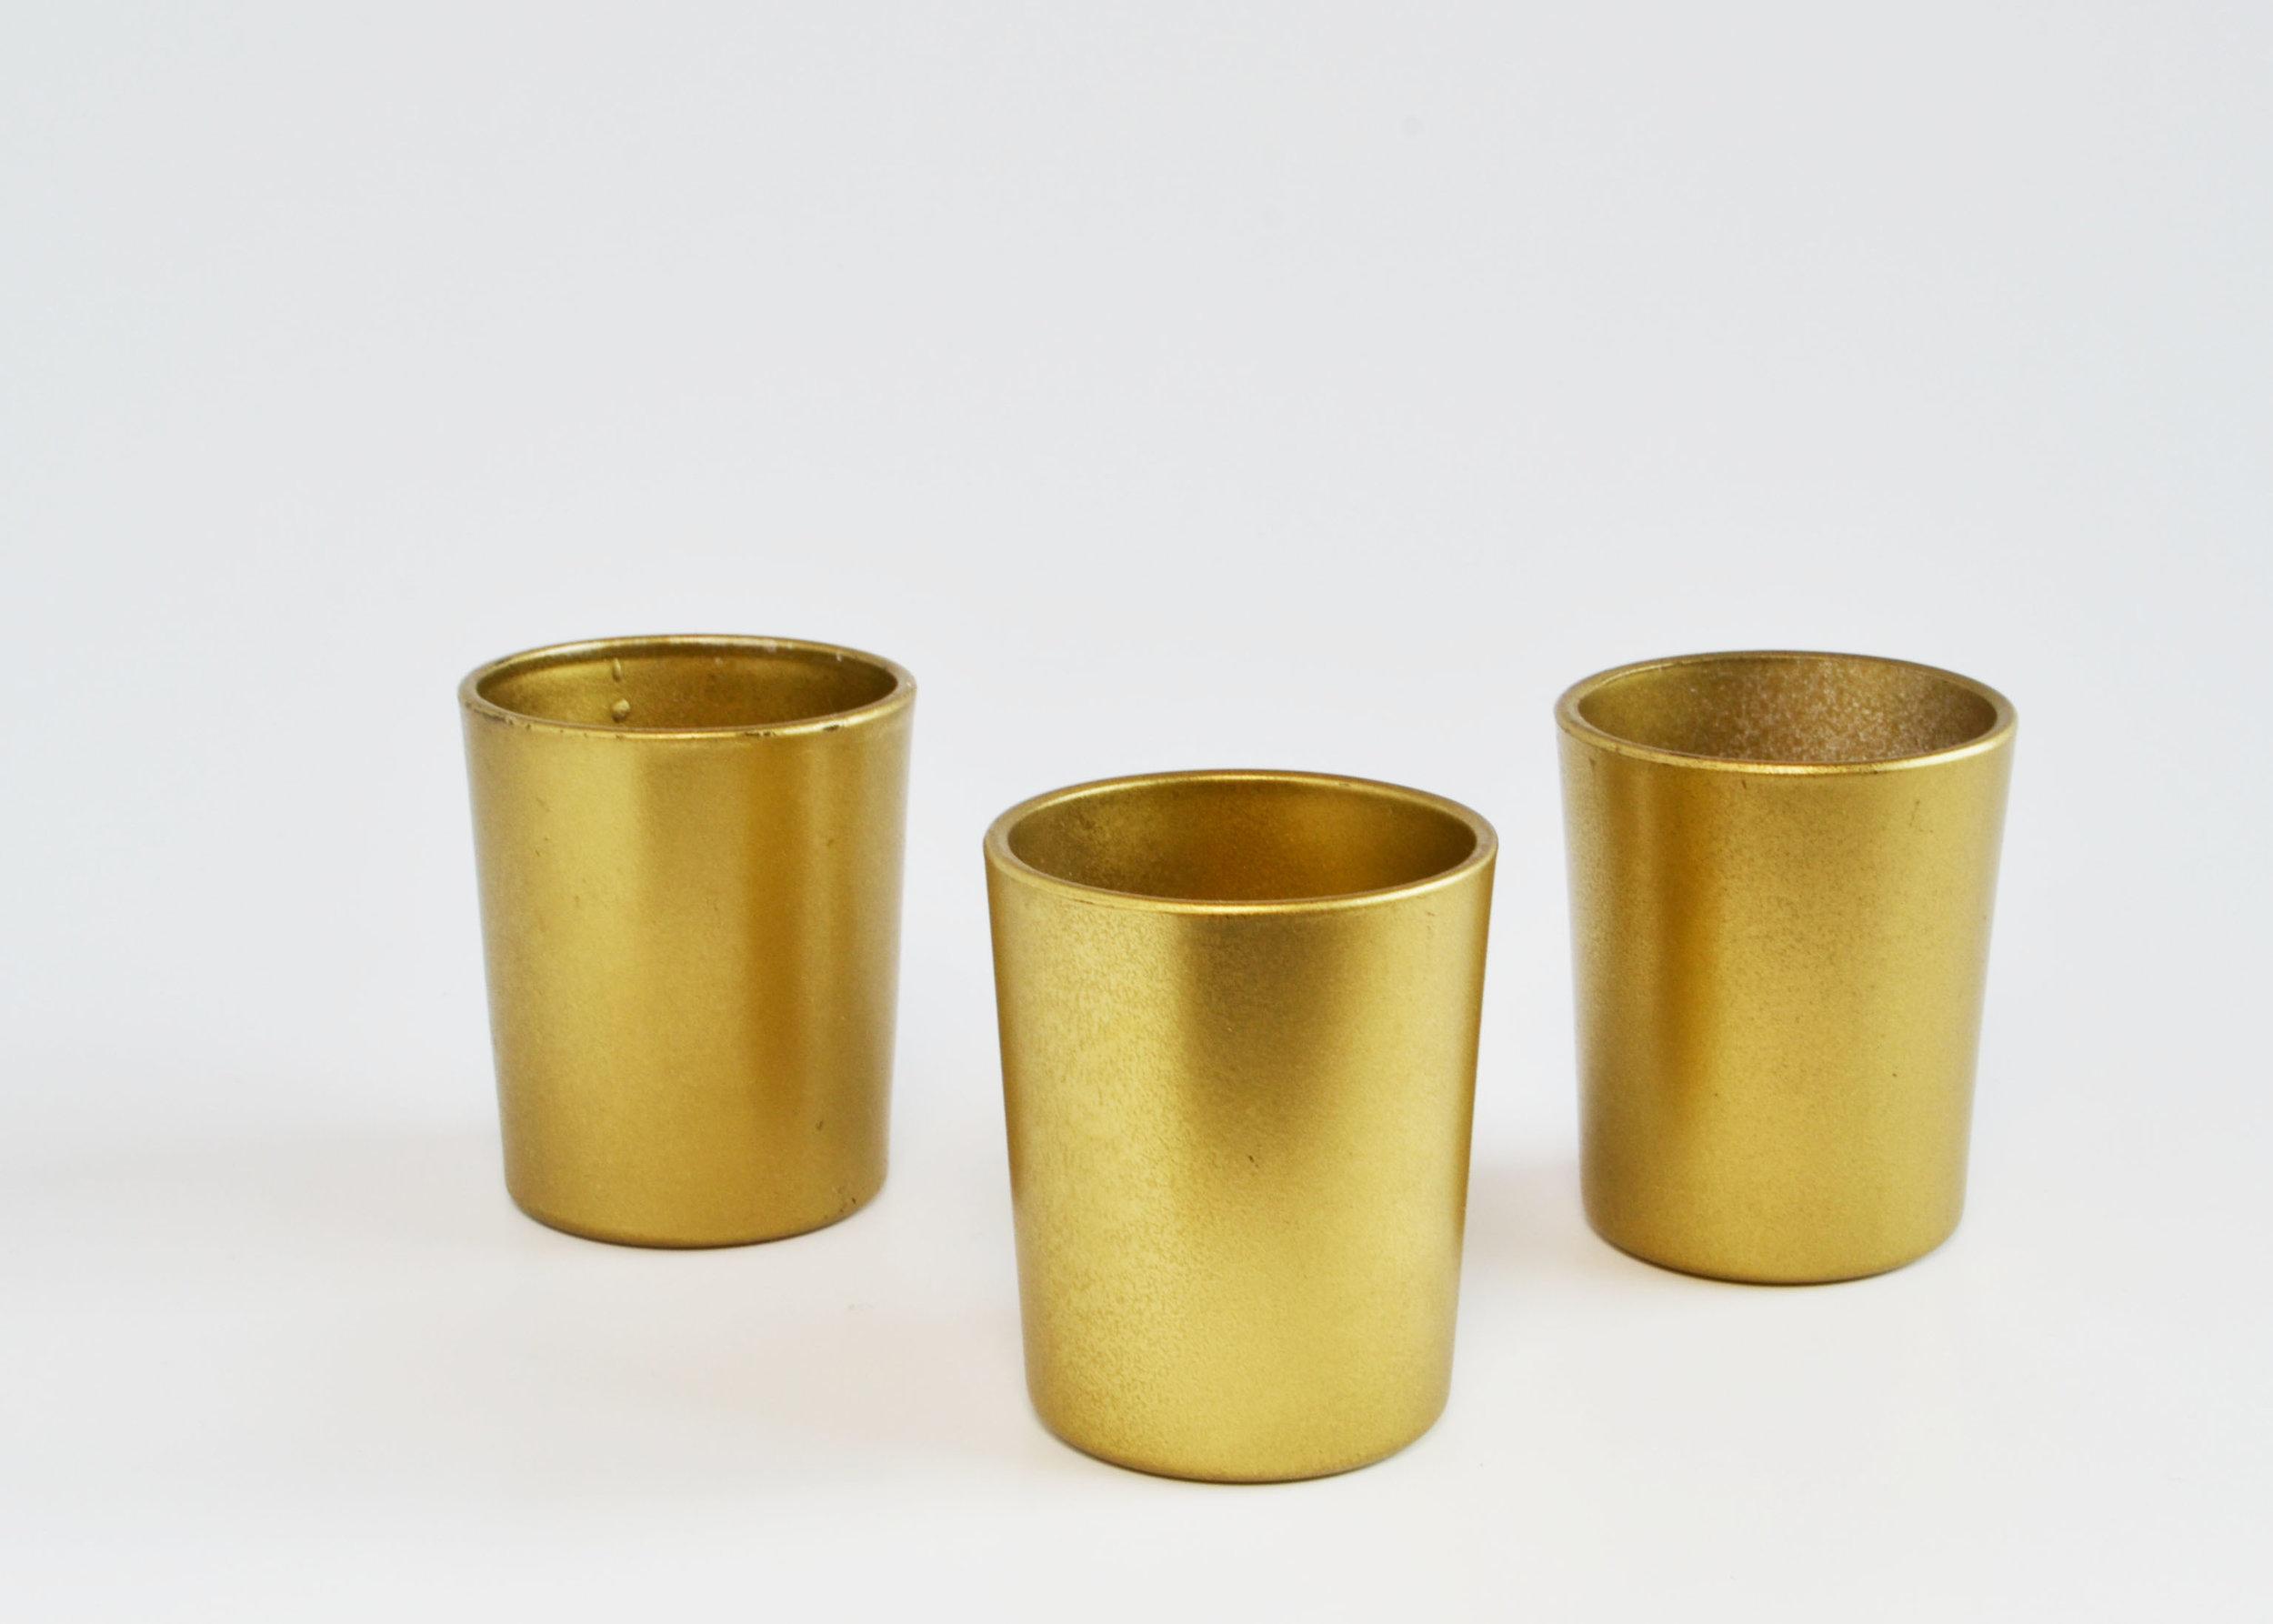 Gold votive   Quantity: 186  Price: $2.50